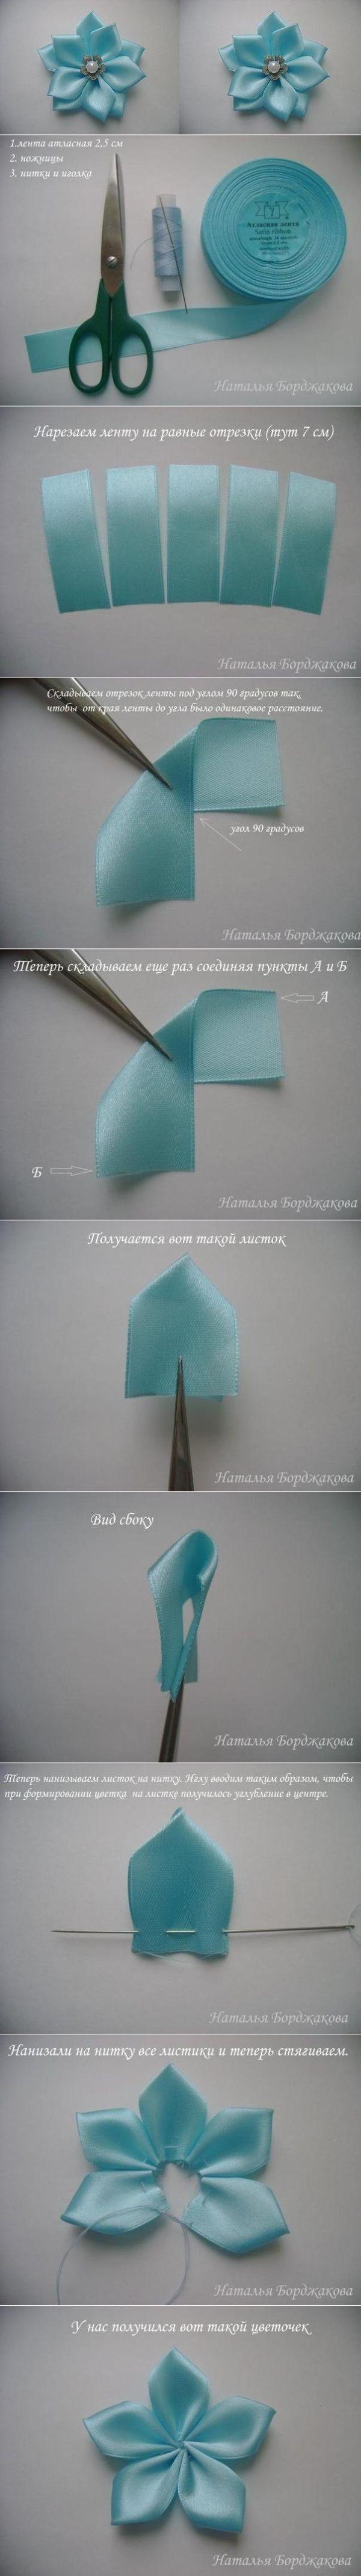 DIY Pointed Petals Ribbon Flower DIY Pointed Petals Ribbon Flower by catrulz